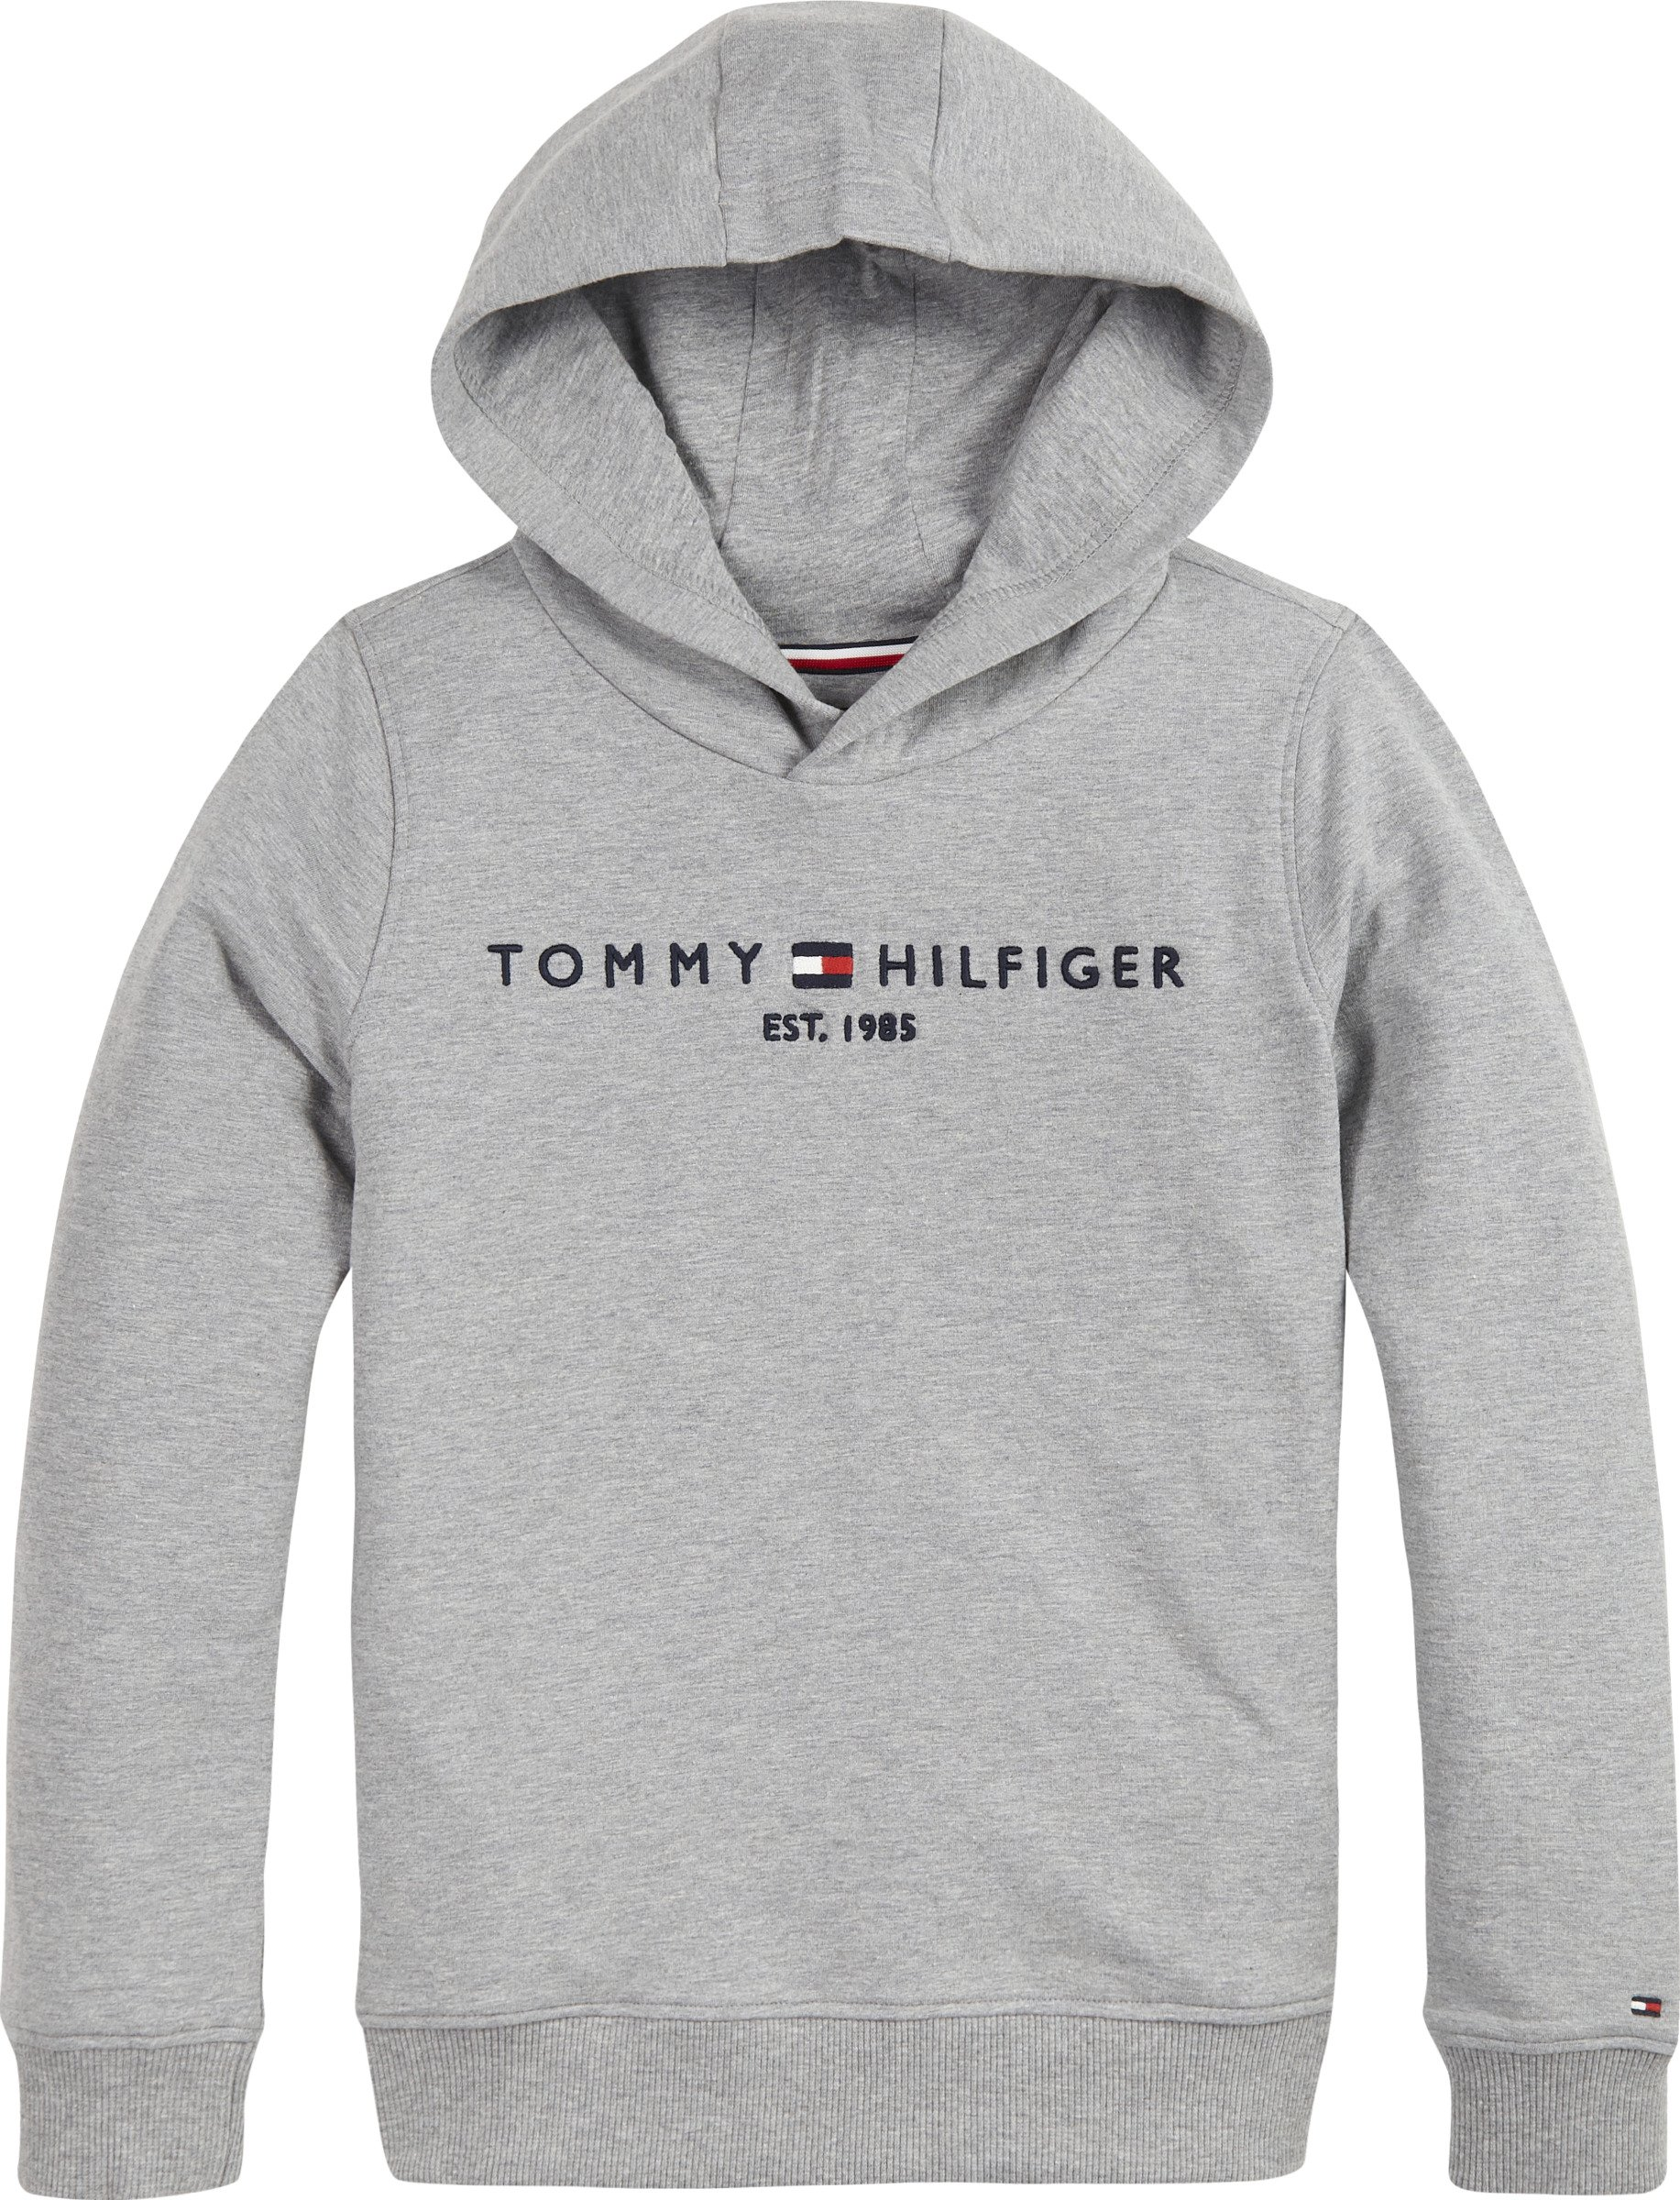 Tommy Hilfiger, Nuorten Essential huppari, harmaa